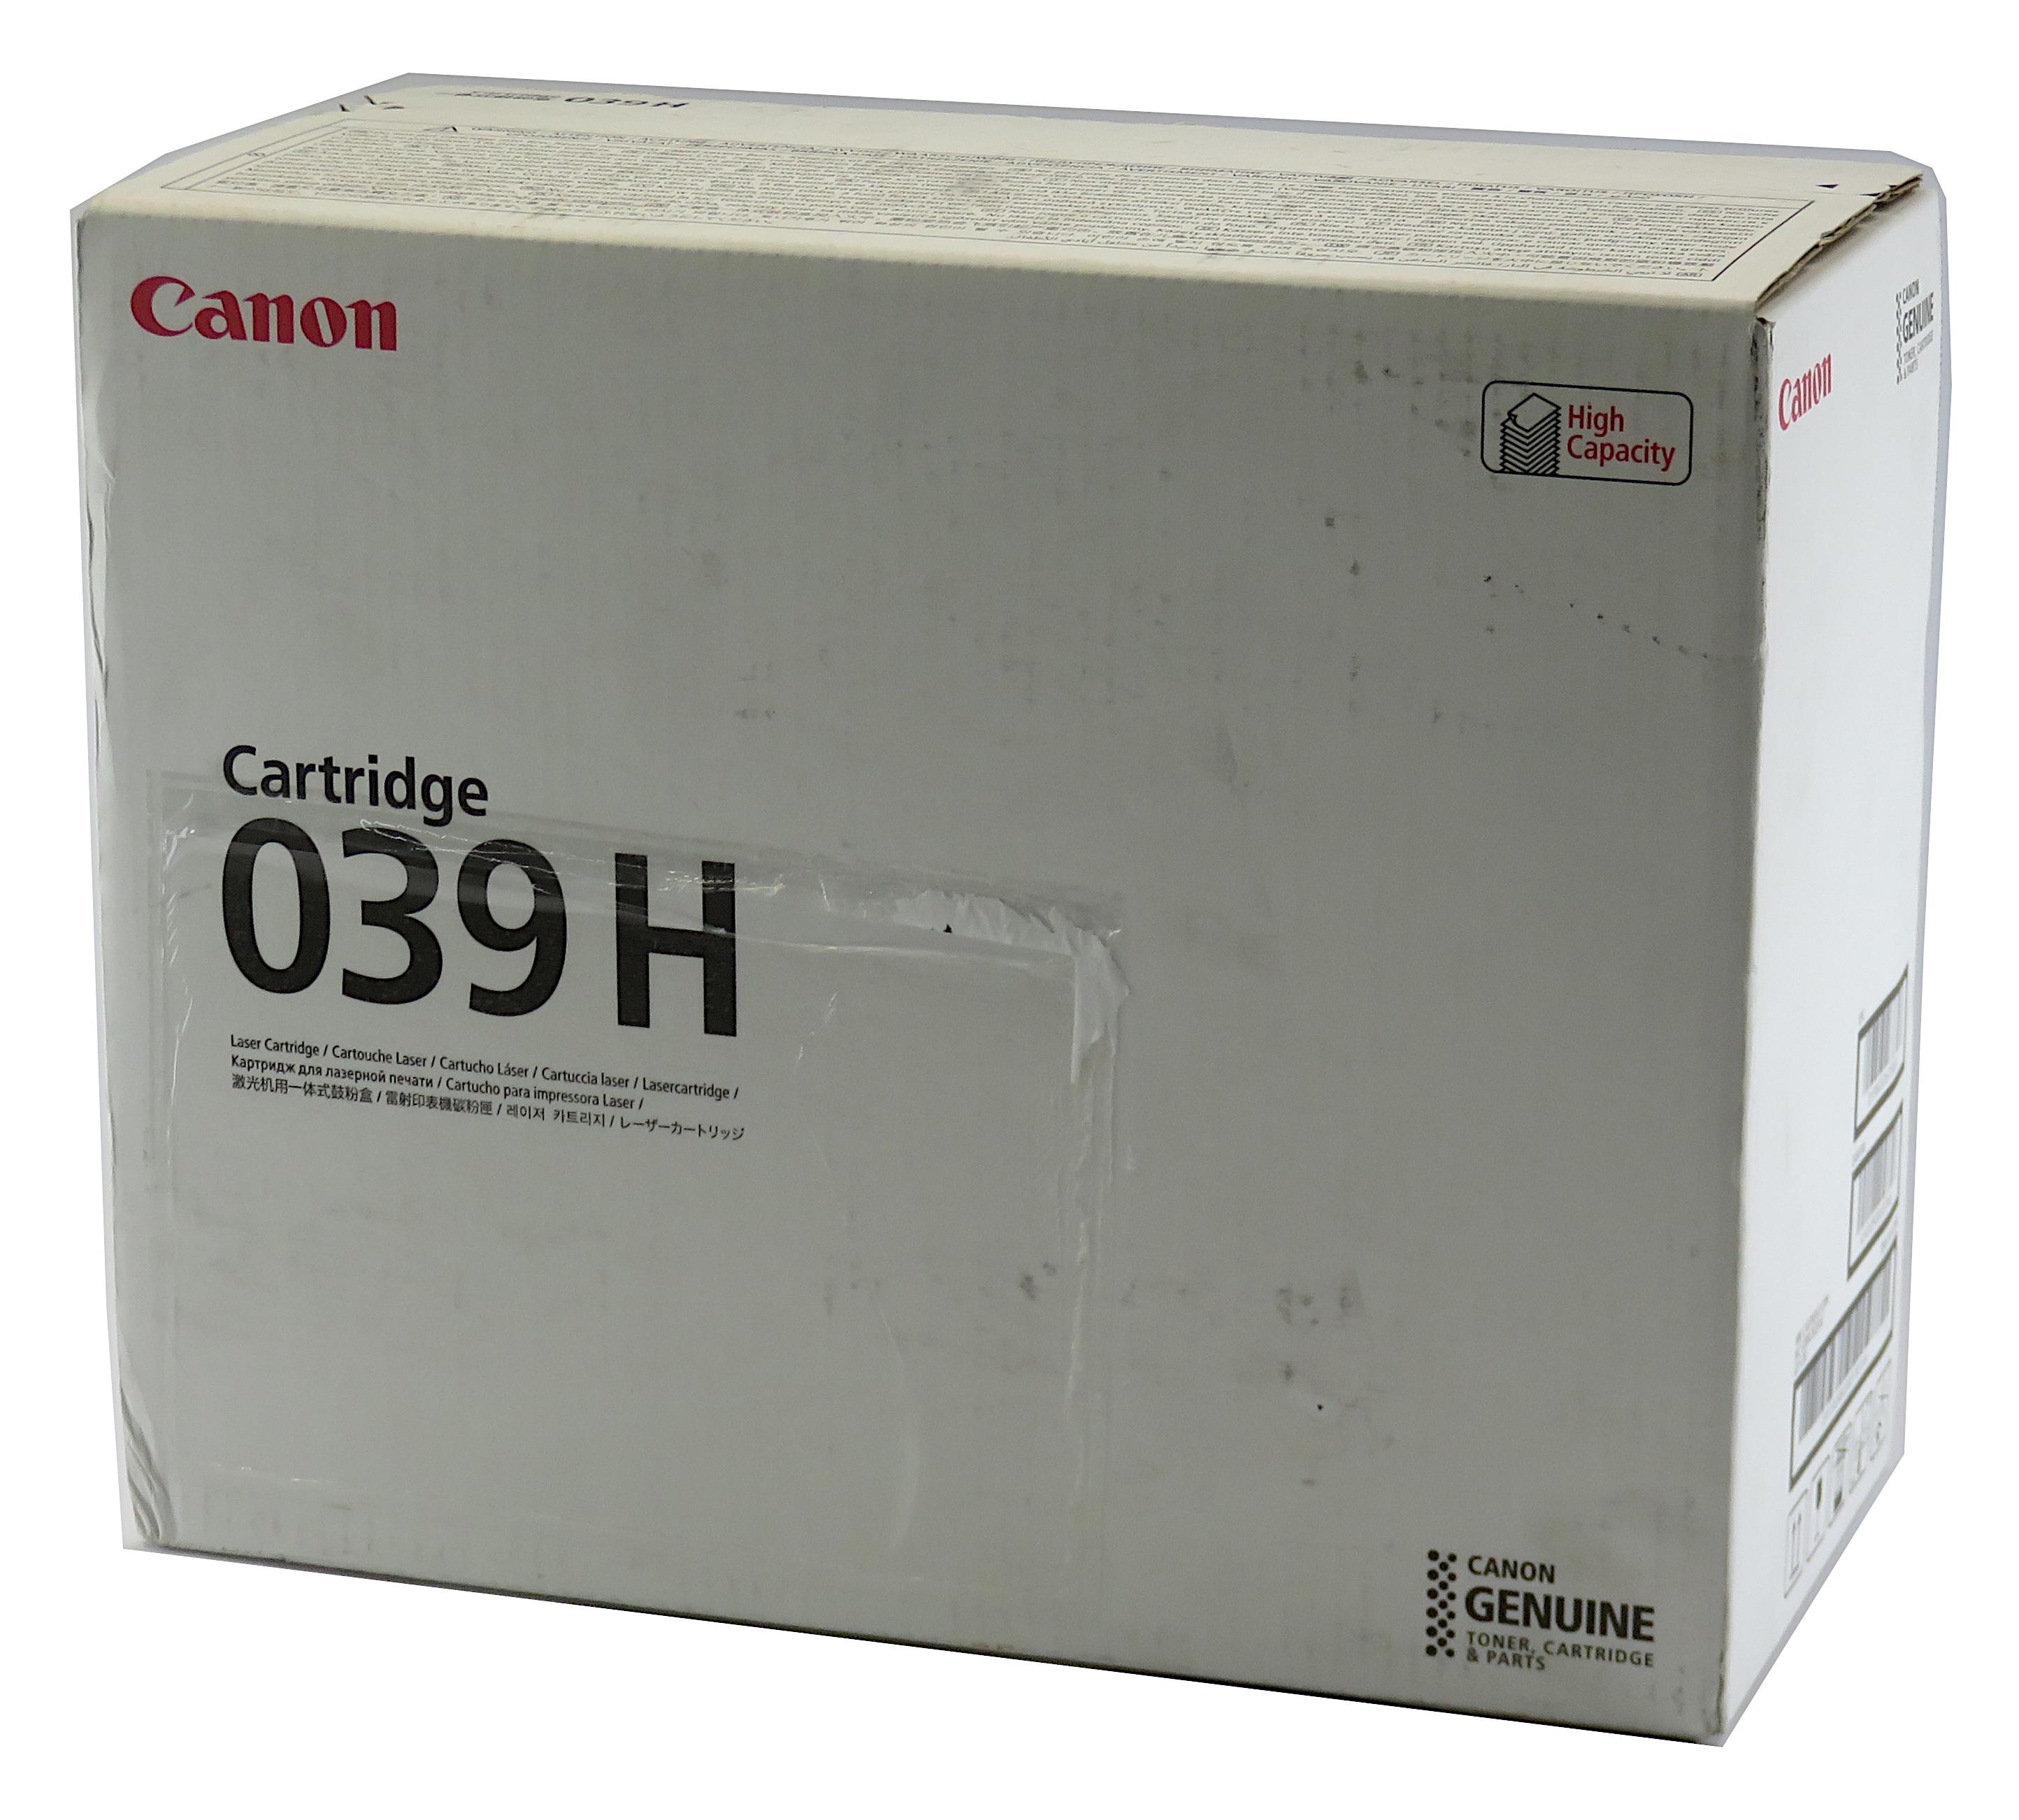 New Genuine Canon 039H High-Capacity Laser Toner Cartridge for LBP351 & LBP352